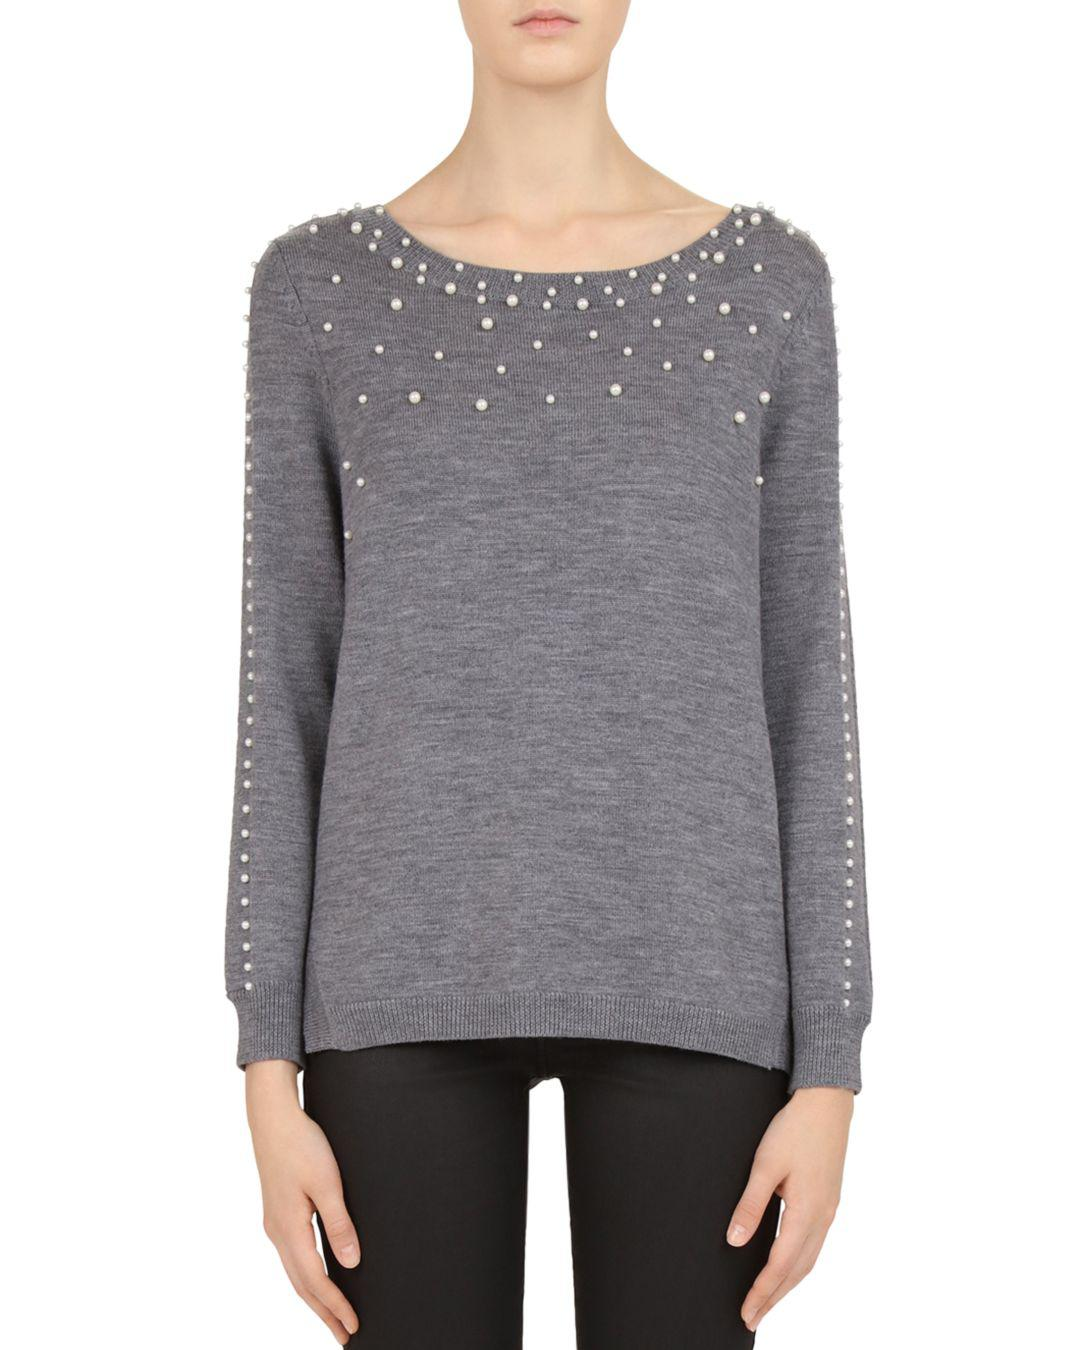 fb5d388c8 Gerard Darel Catherine Embellished Merino-wool Sweater in Gray ...